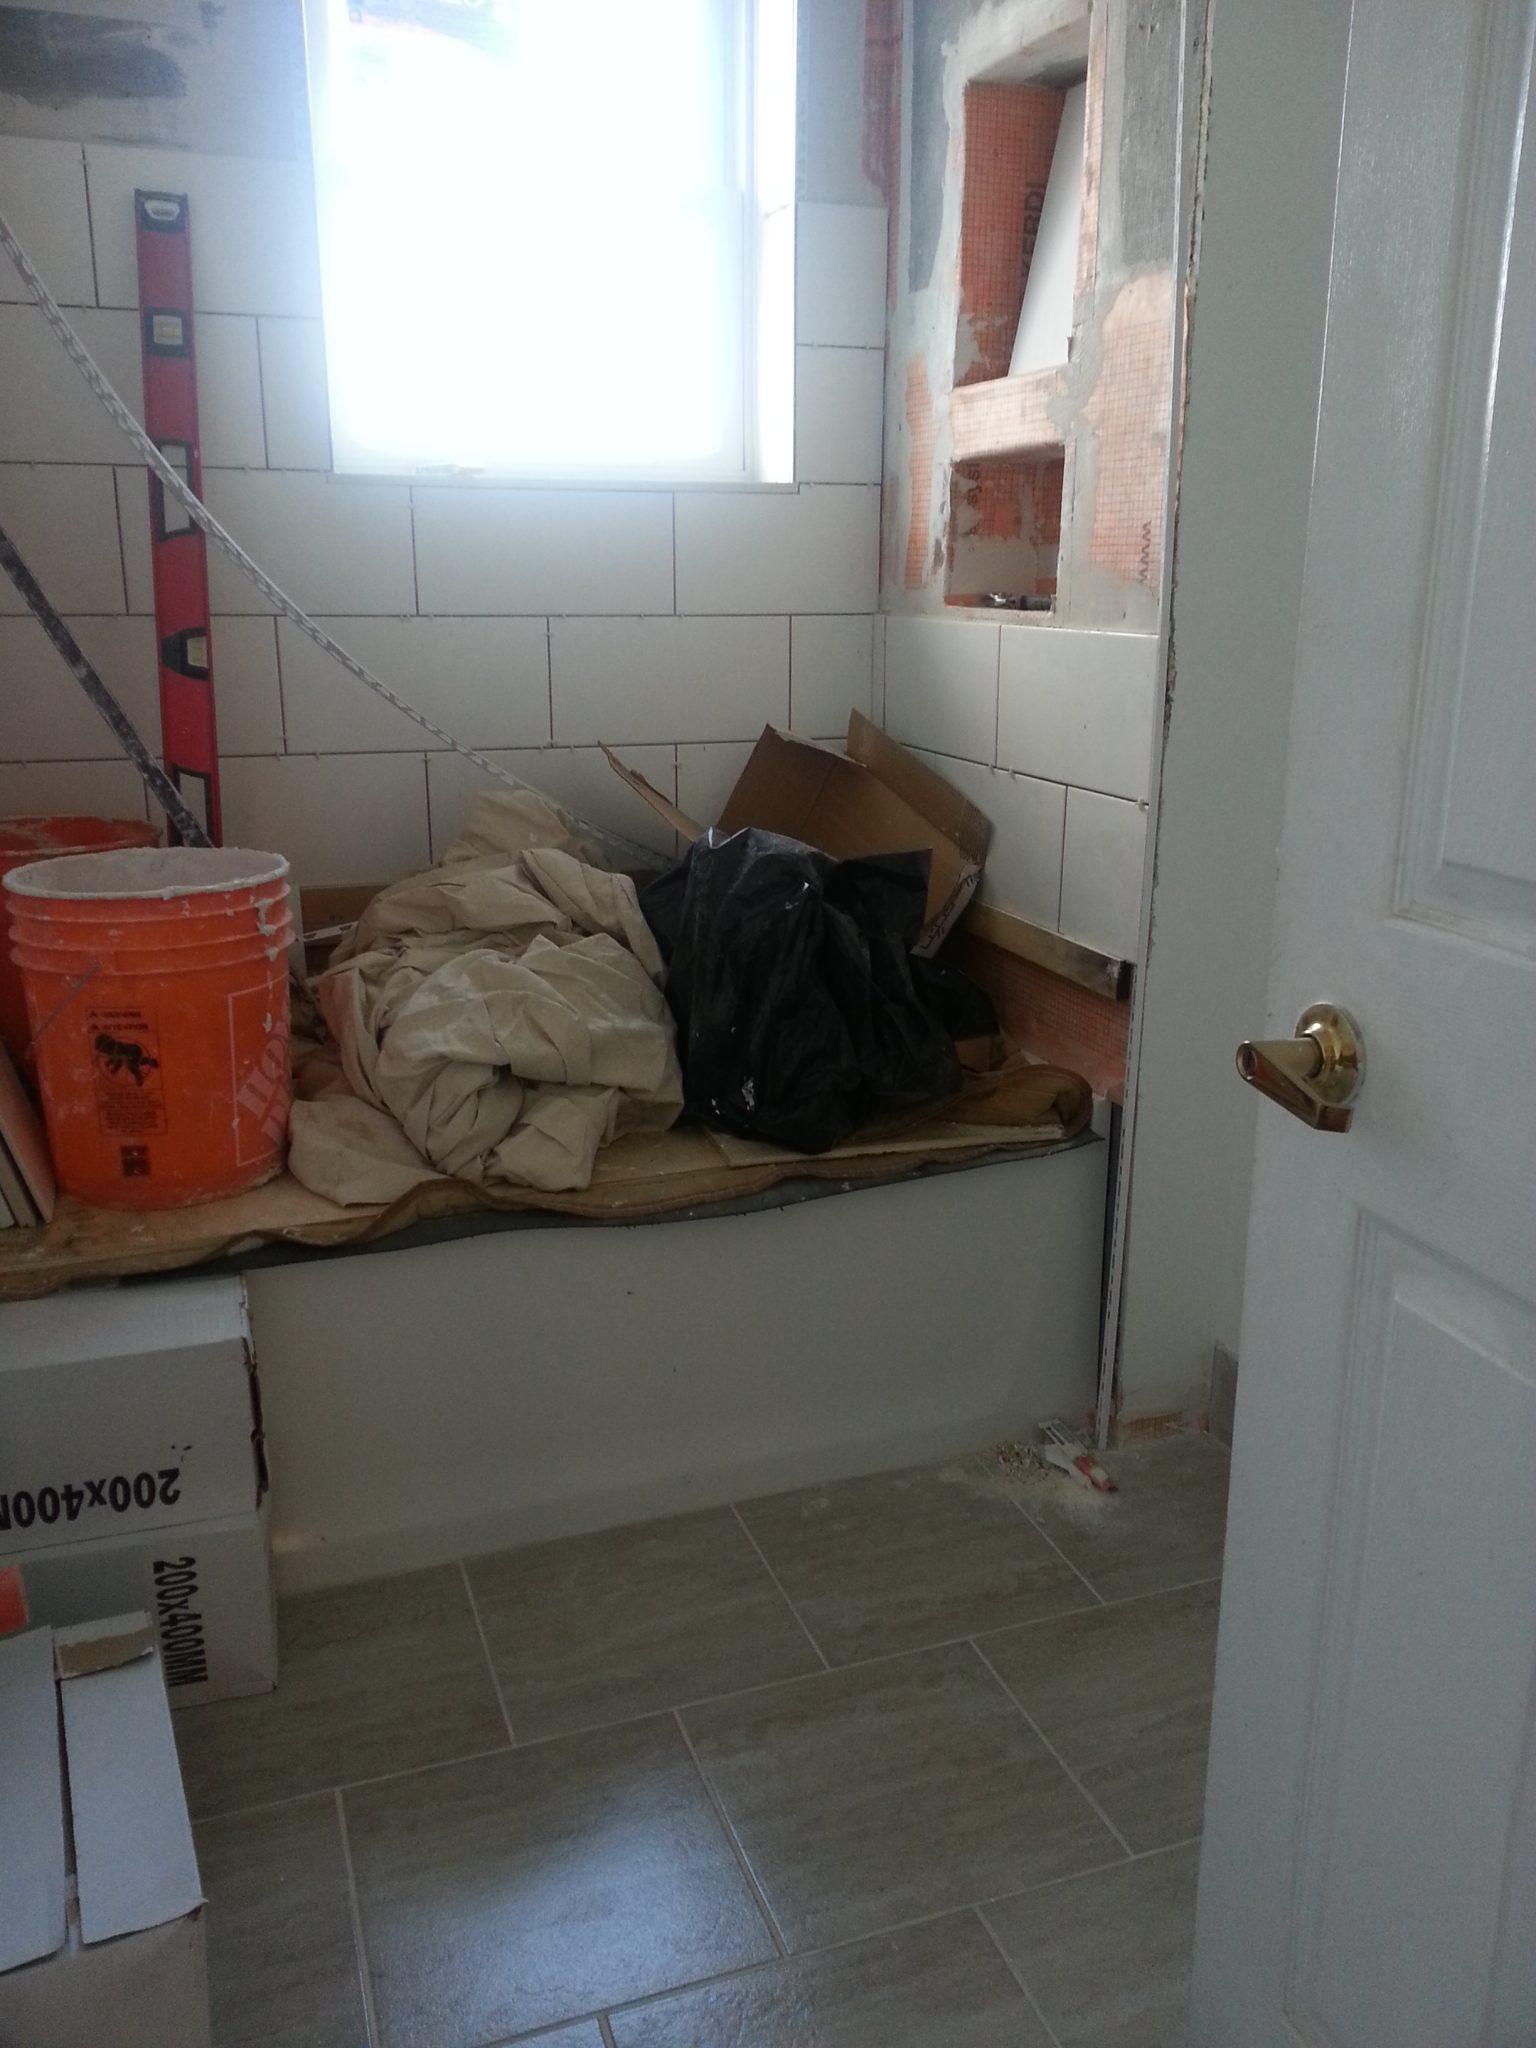 Tiny Bathroom Reno